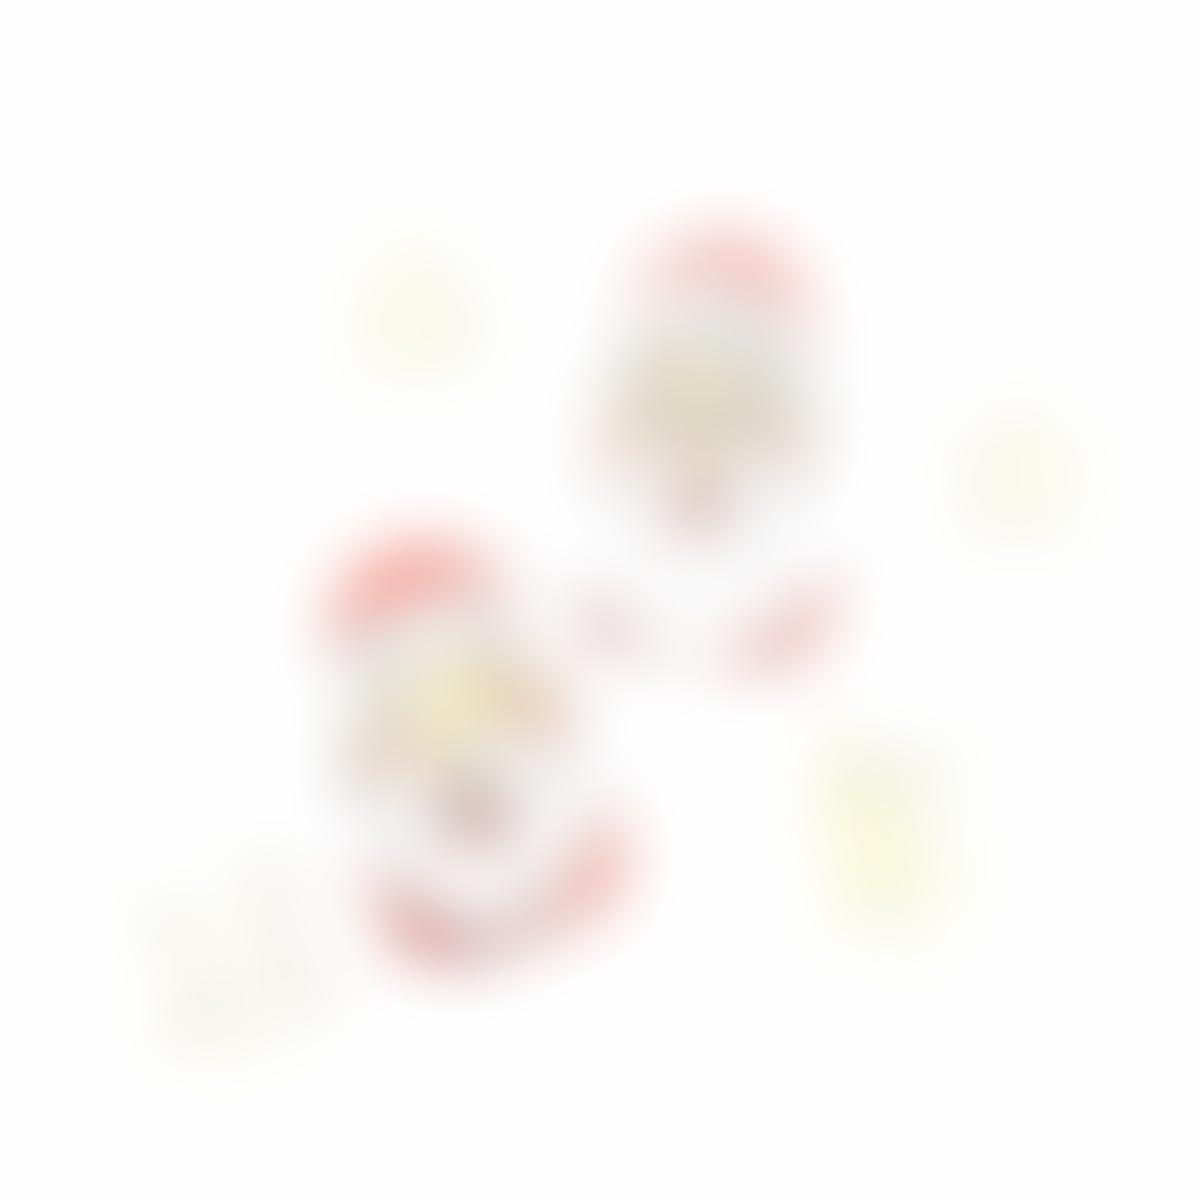 Coloriage Emoji Pizza.Coloriage A Imprimer Gratuit Smiley Caca Papedelca Com